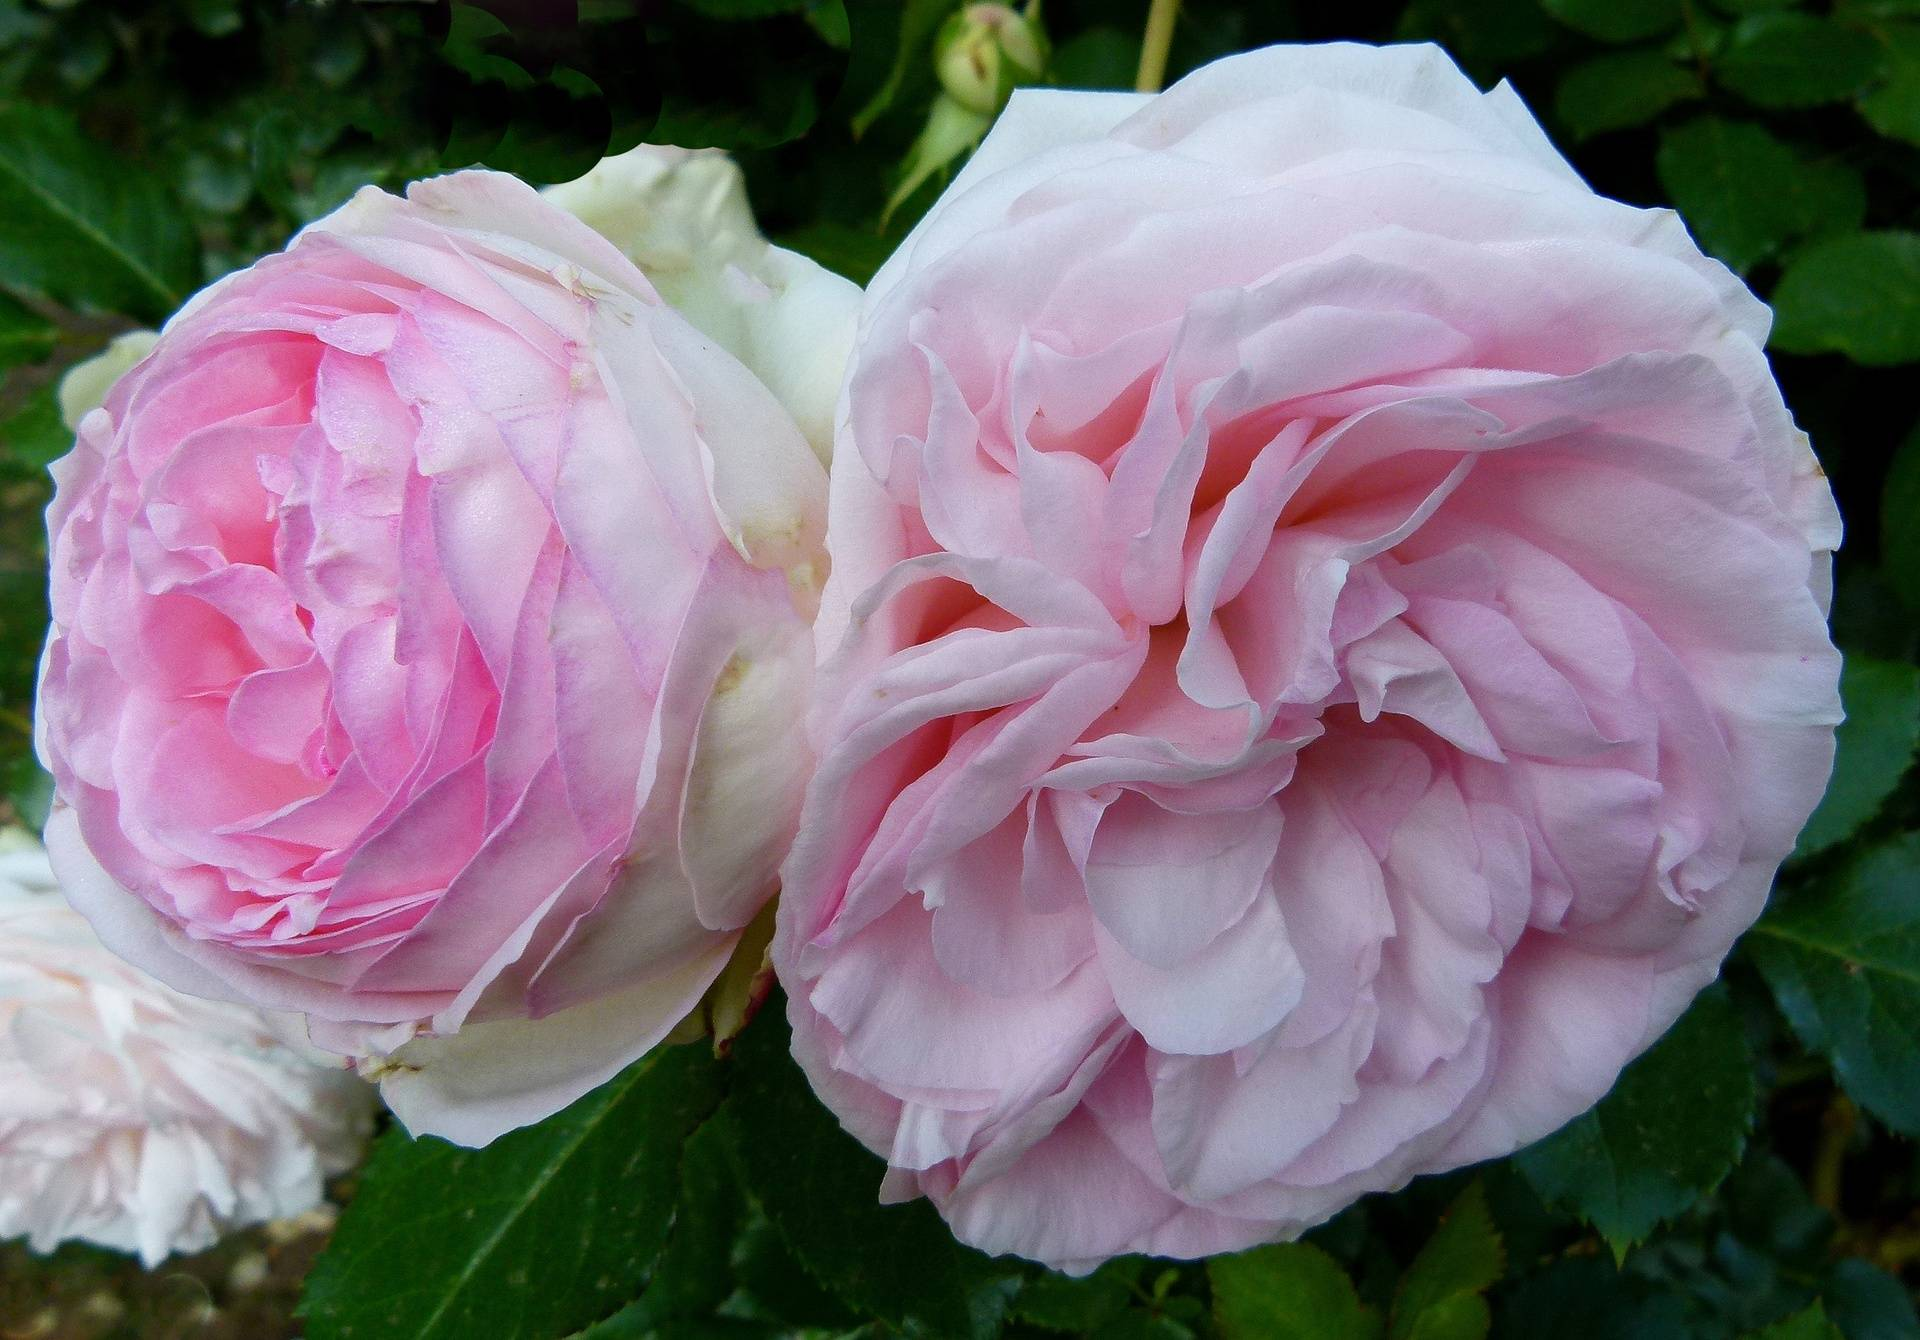 Roses at Millpond